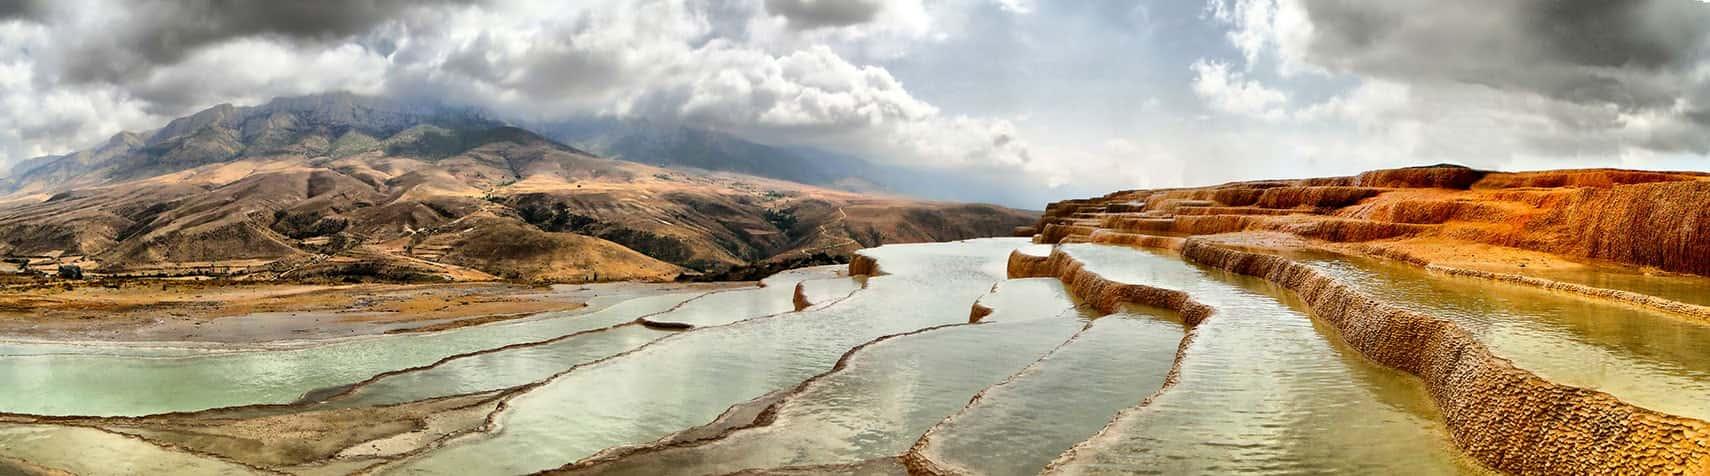 Badab-e-Surt-Iran-min (1)